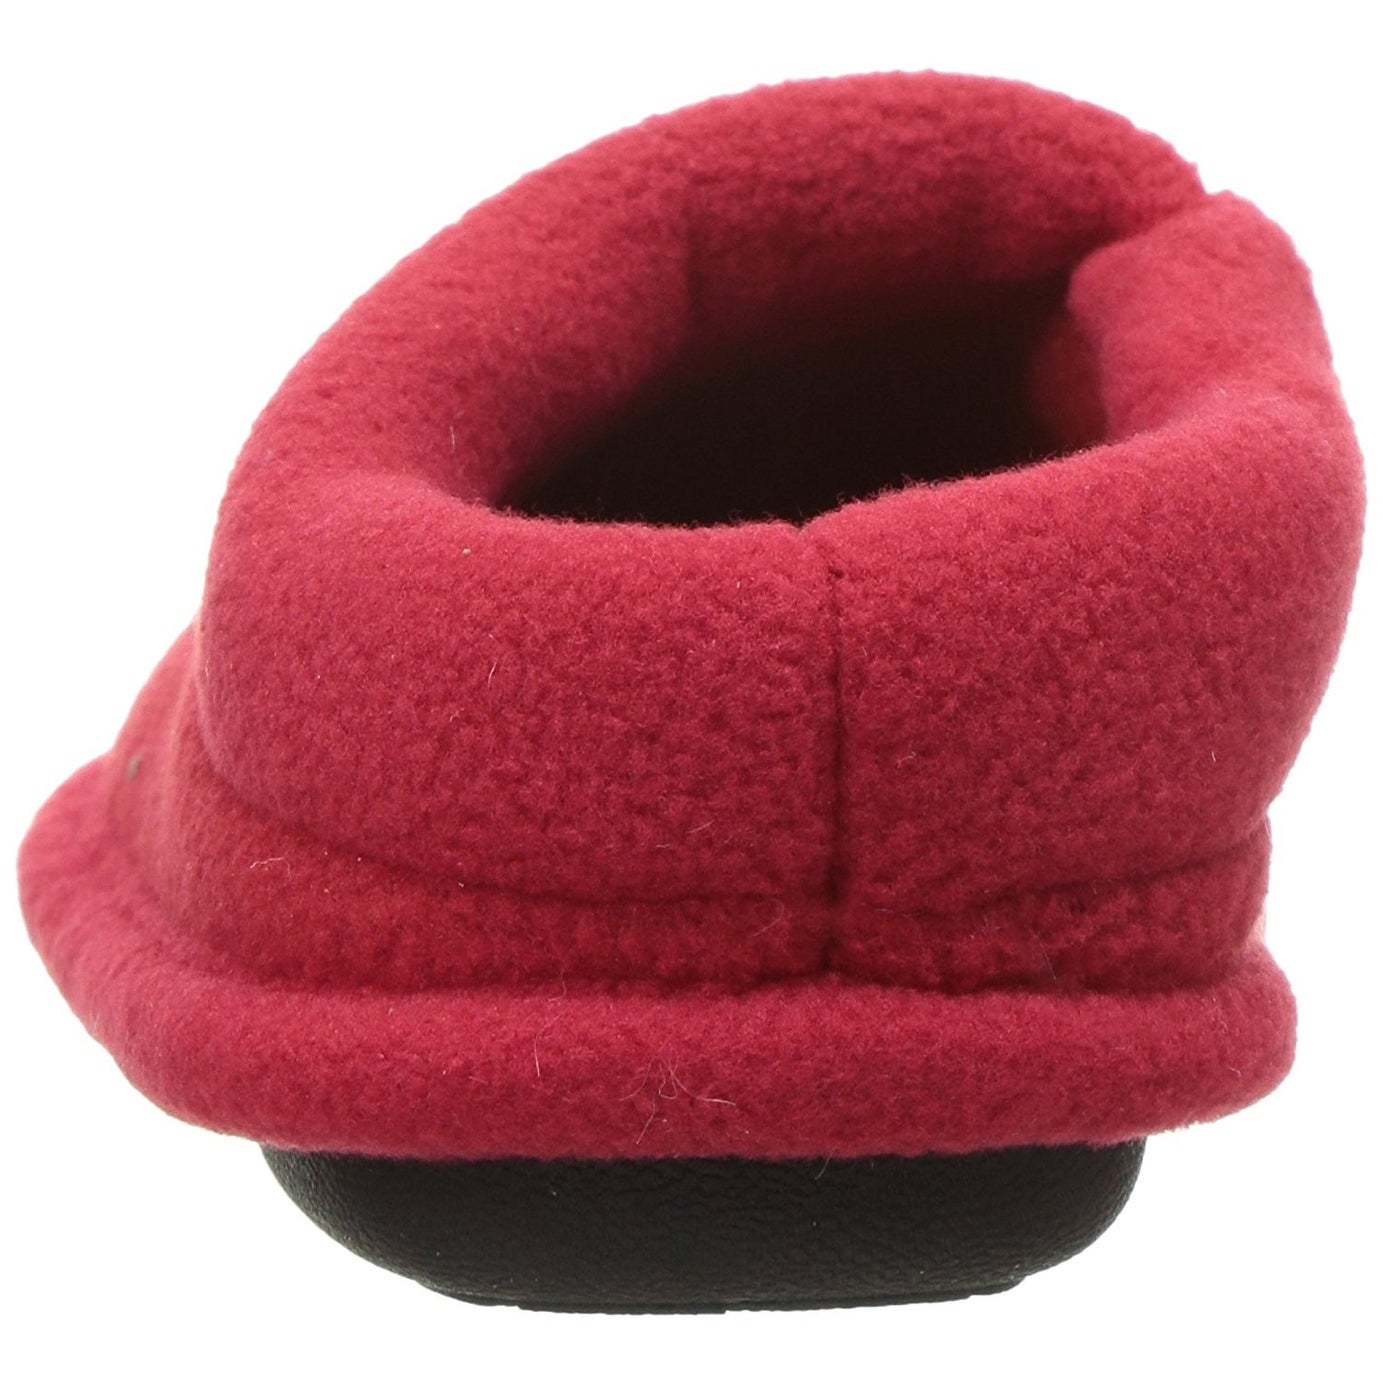 48e6e6d63713e Shop Dearfoams Boys Novelty Clog Slip On Slide Slippers - On Sale - Free  Shipping On Orders Over  45 - Overstock.com - 21652879